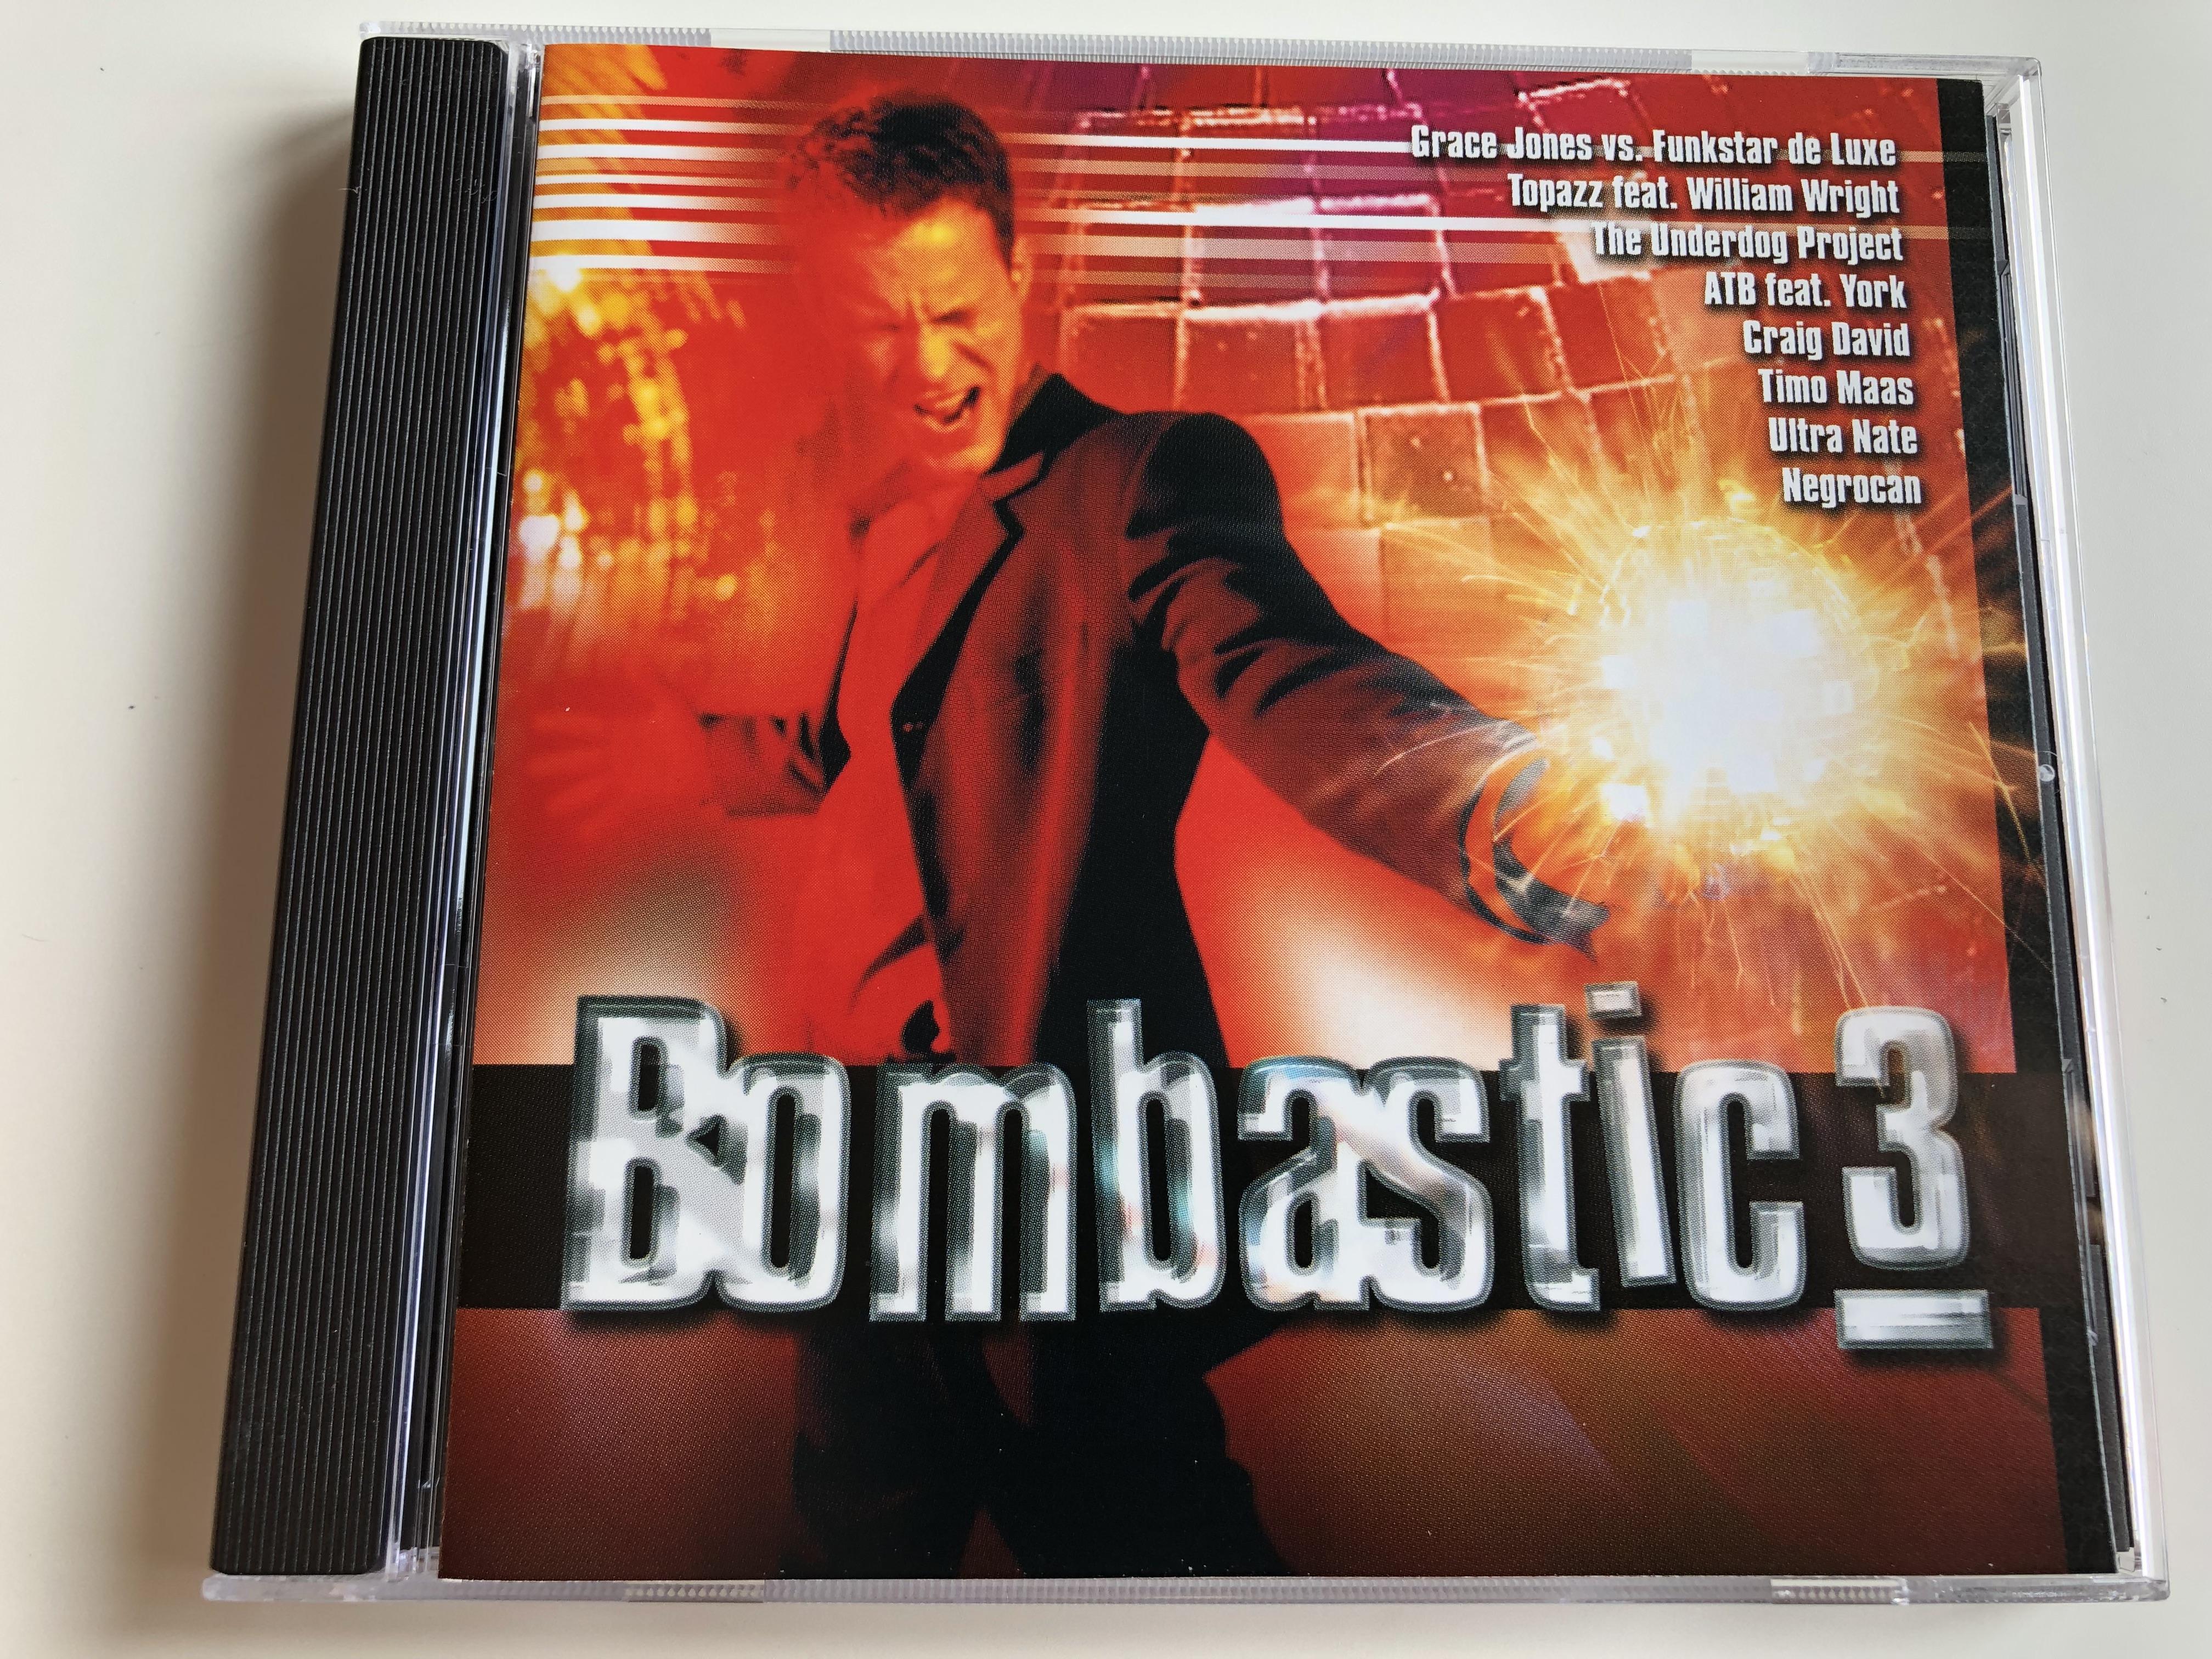 bombastic-3img-2150.jpg